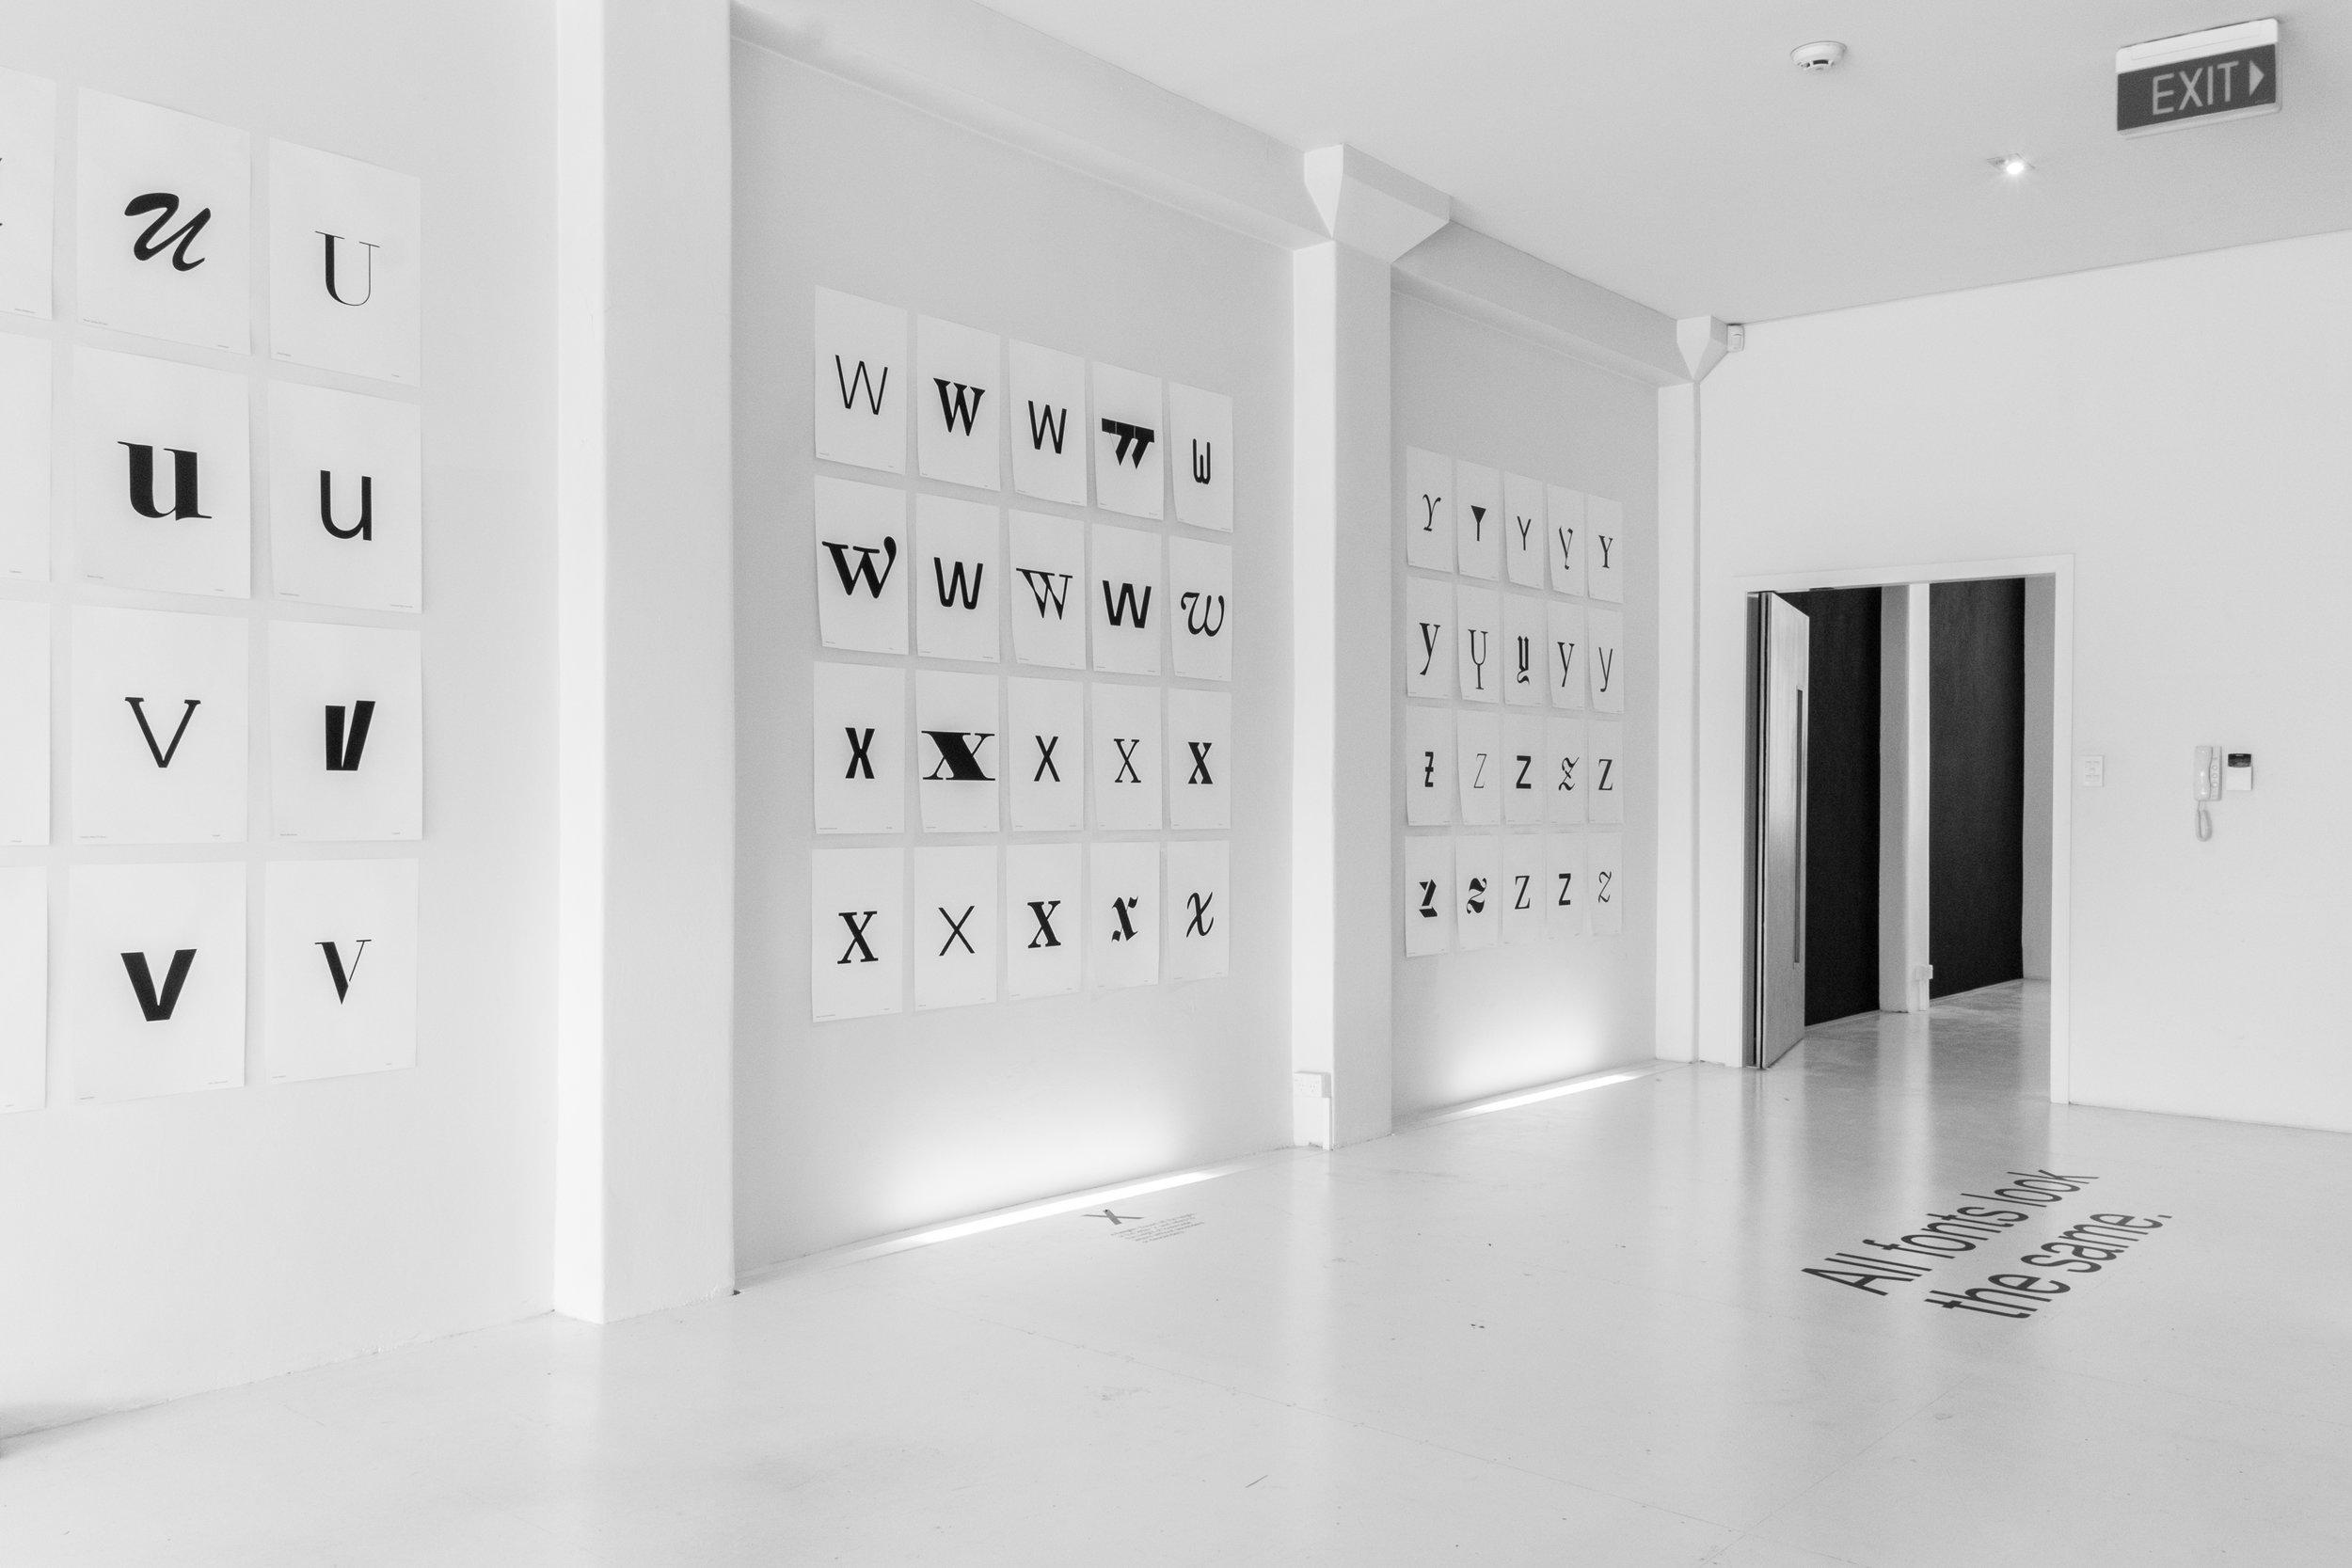 Exhibition-111.jpg